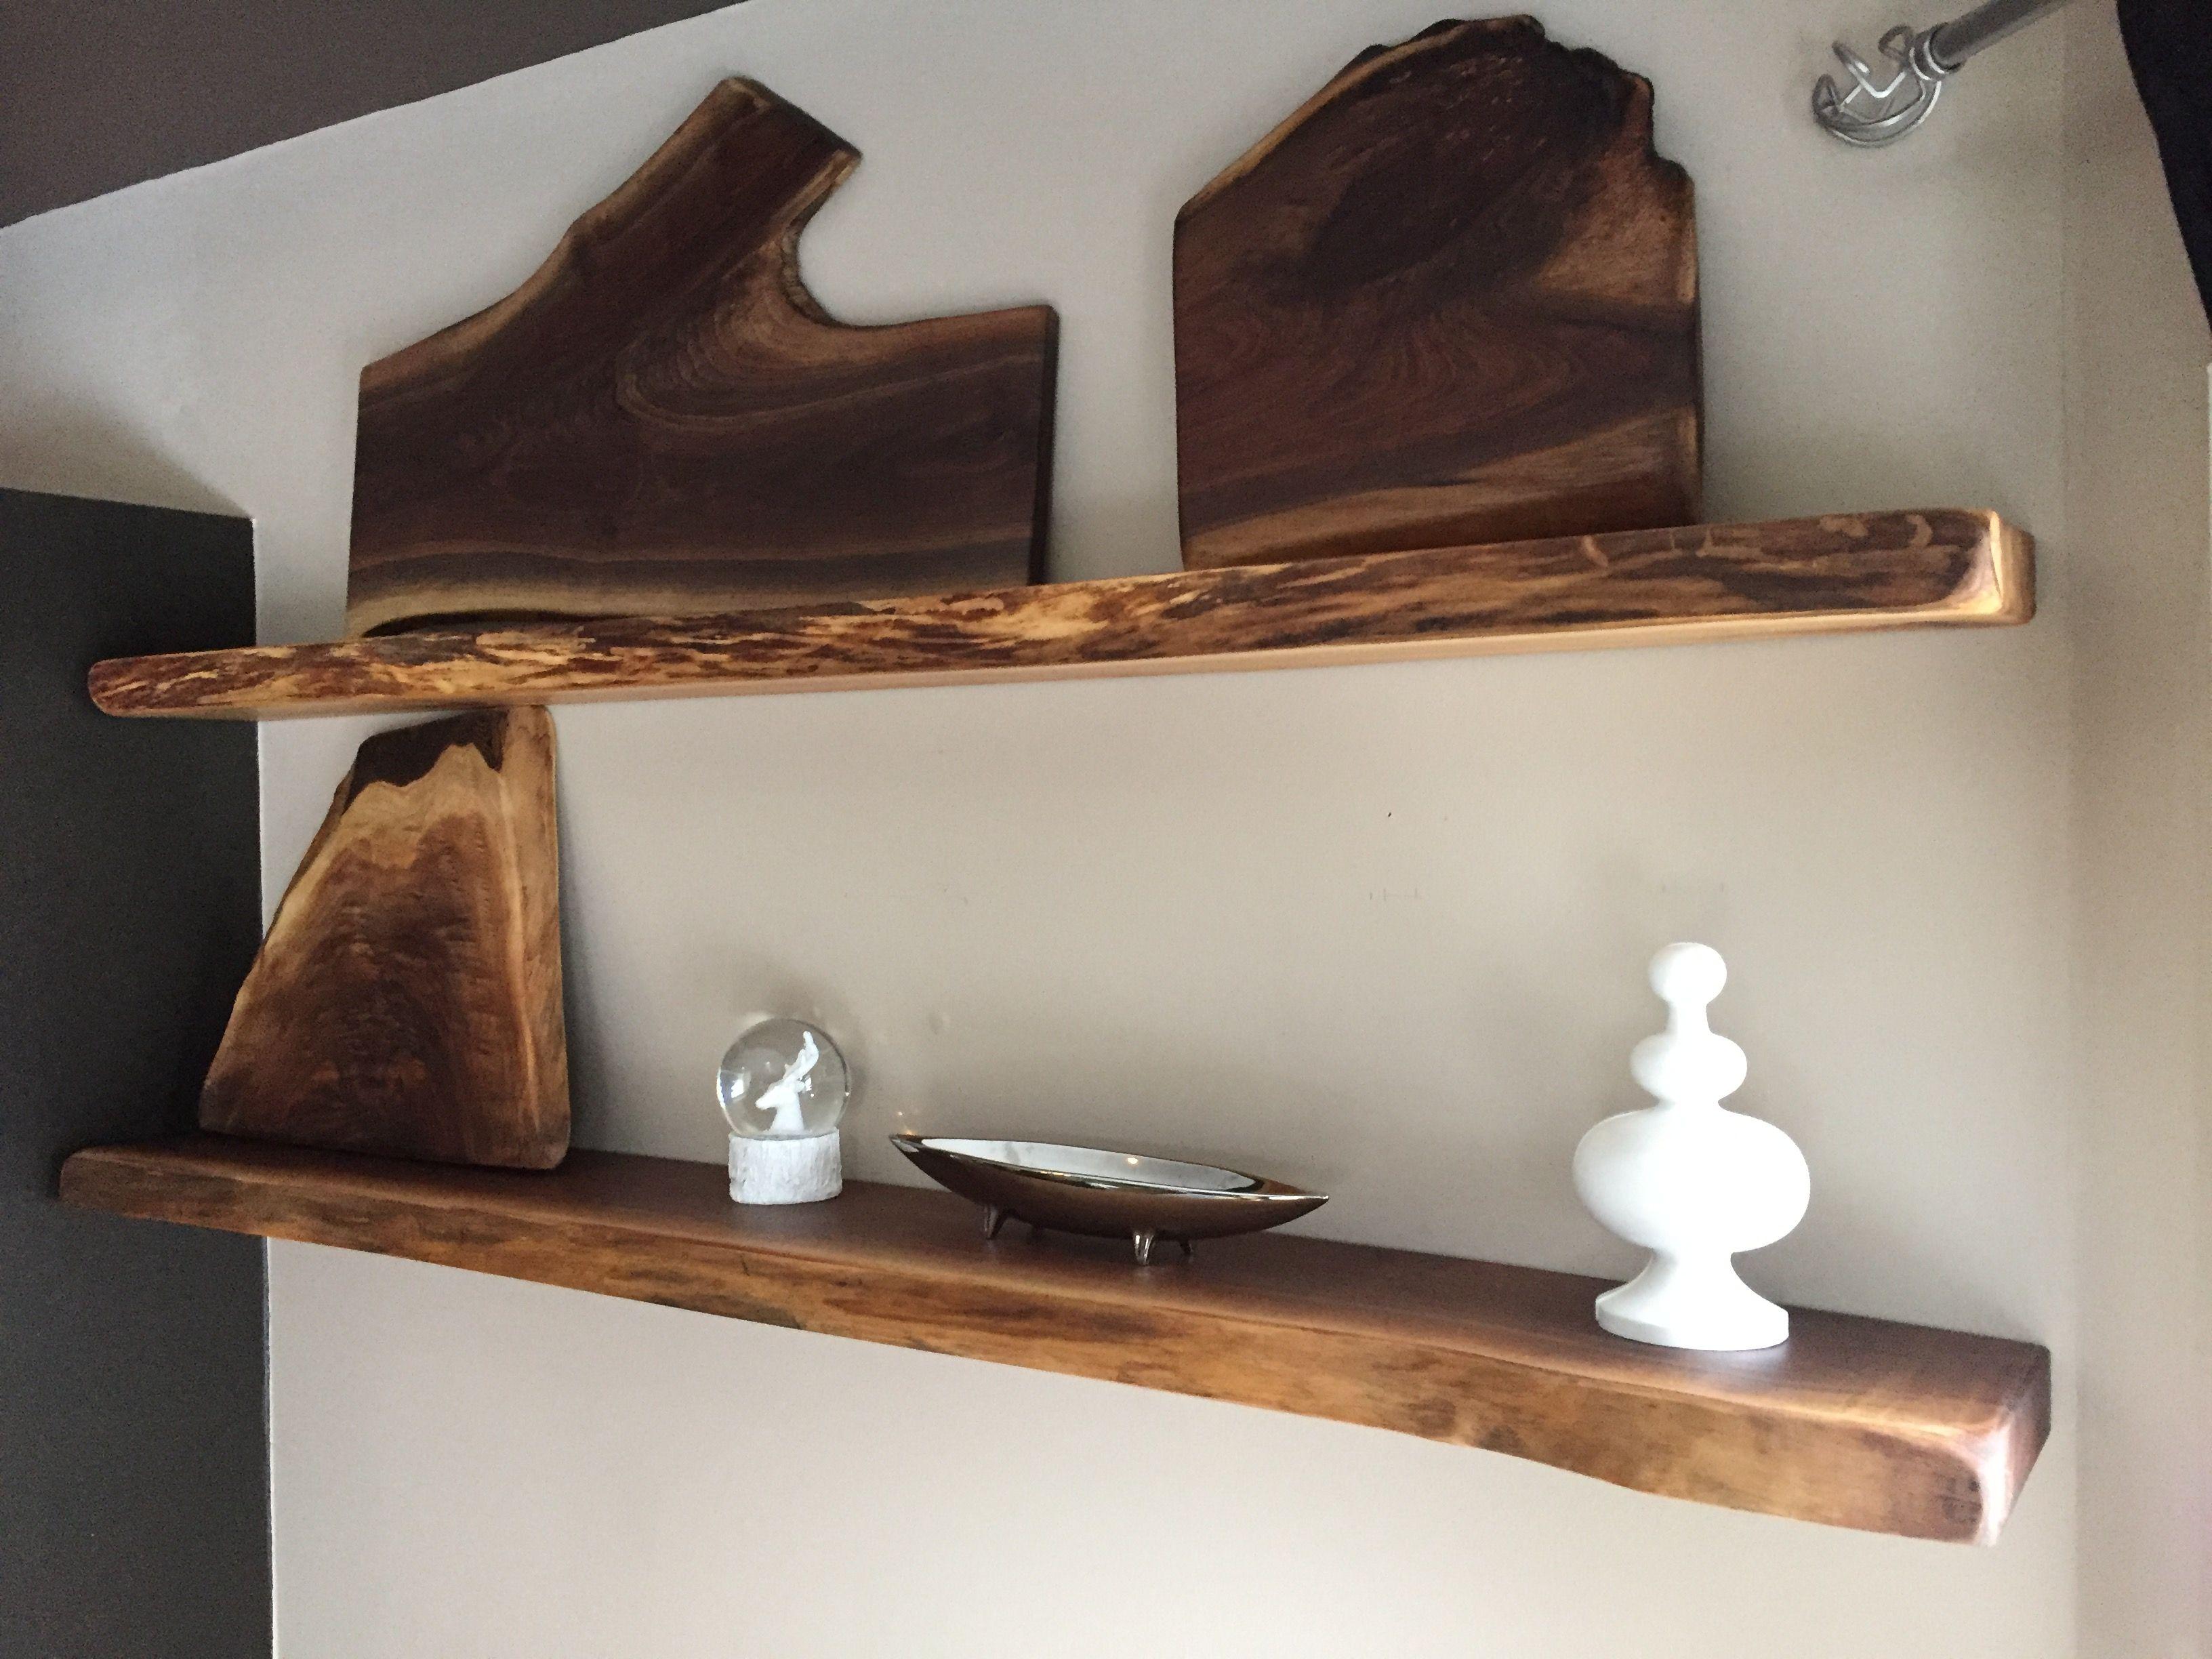 Live Edge Floating Shelf Wood Shelves Natural Open Shelving In